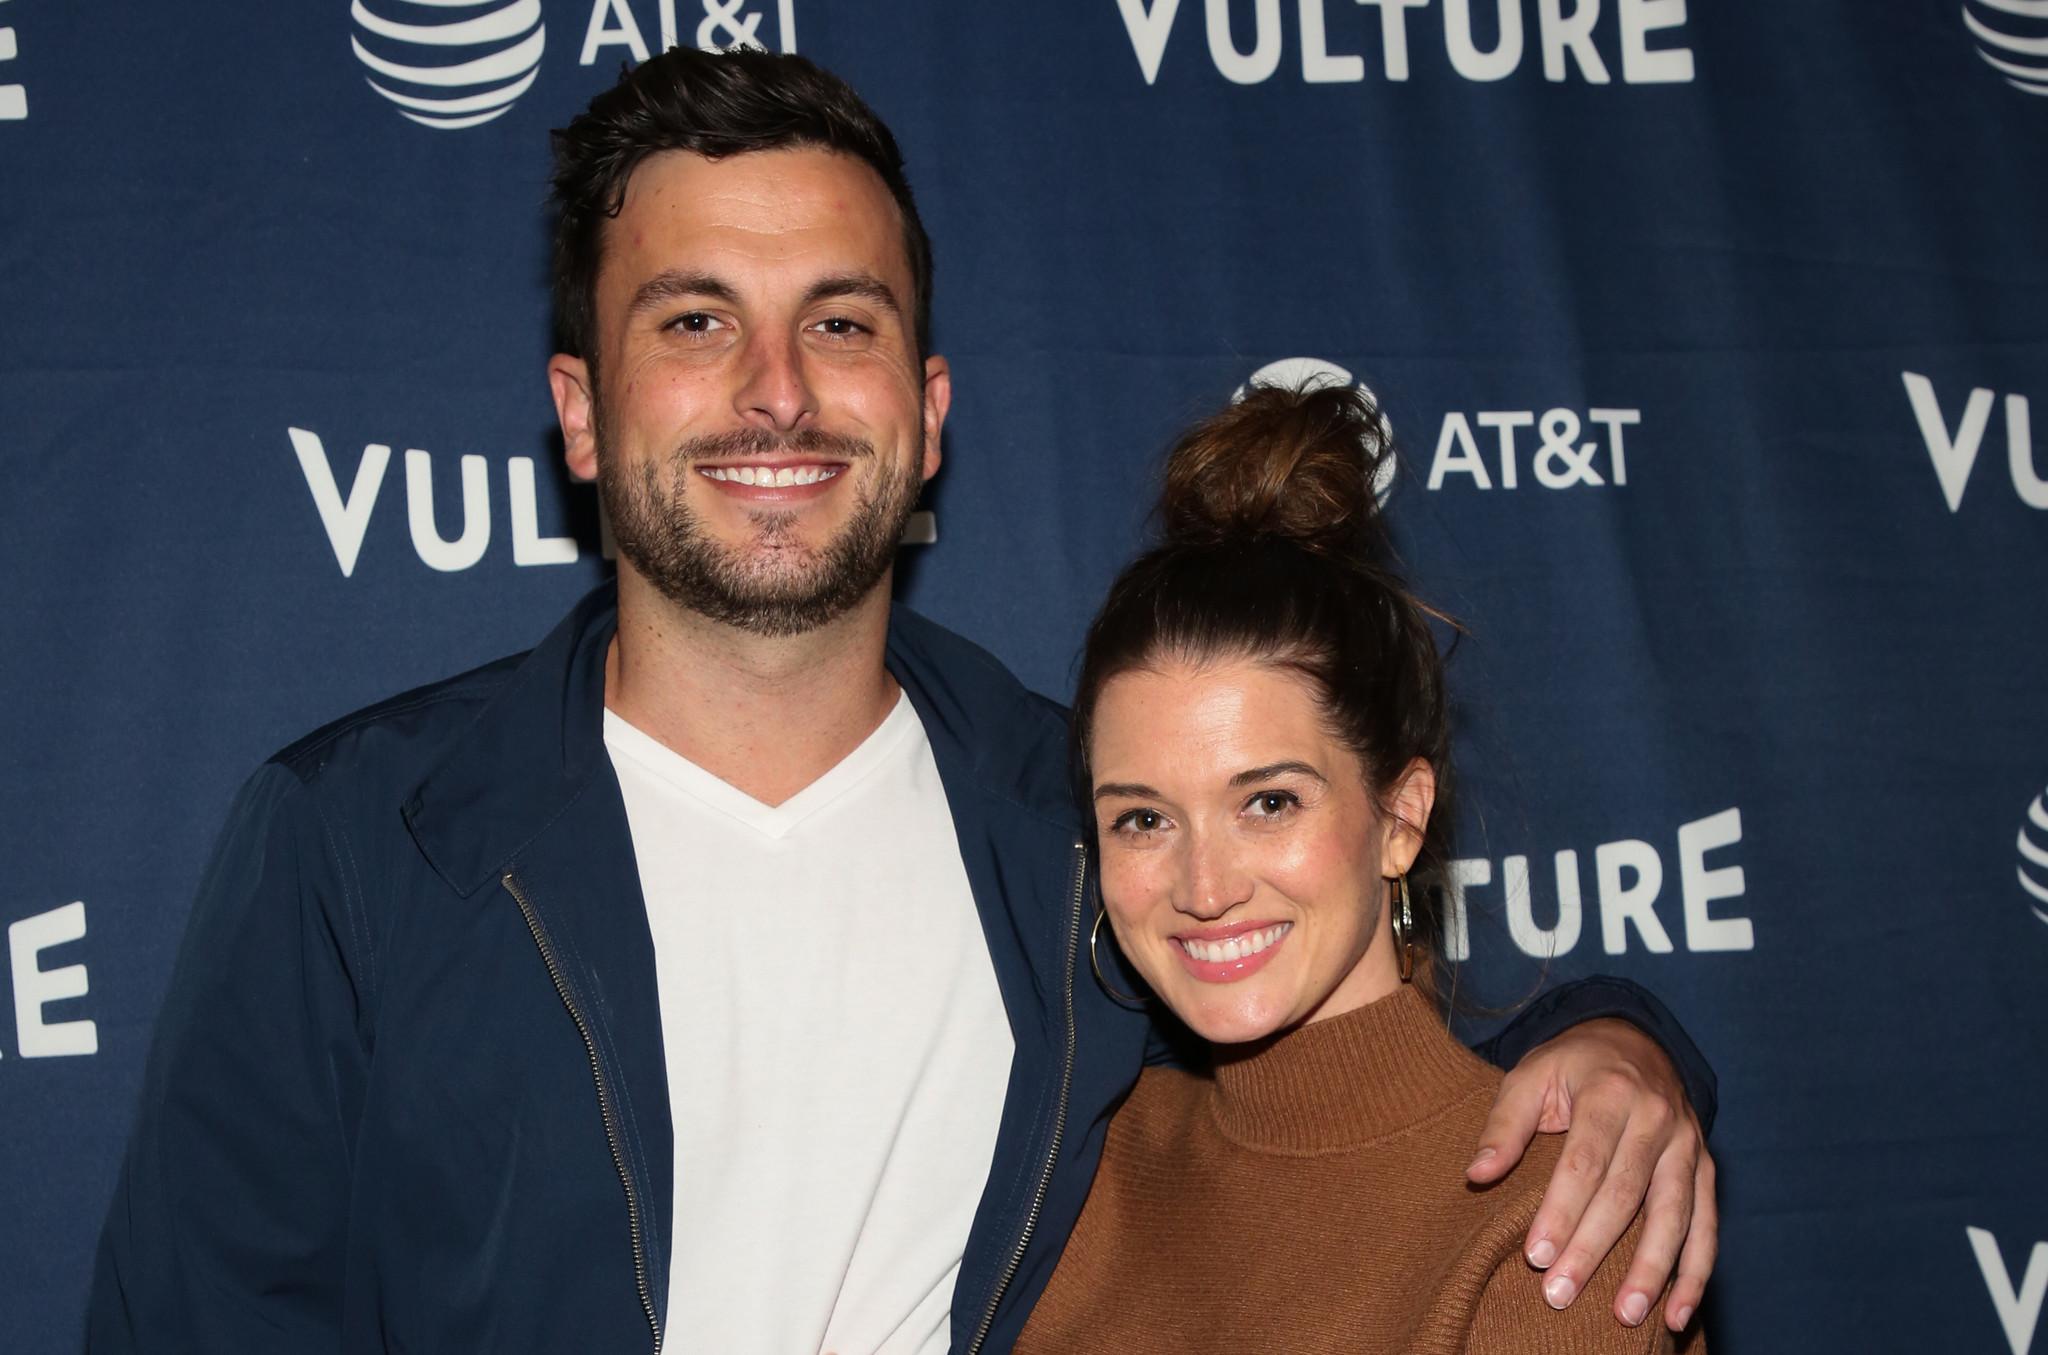 'Bachelor' alum Jade Roper Tolbert loses $1 million won on DraftKings after...